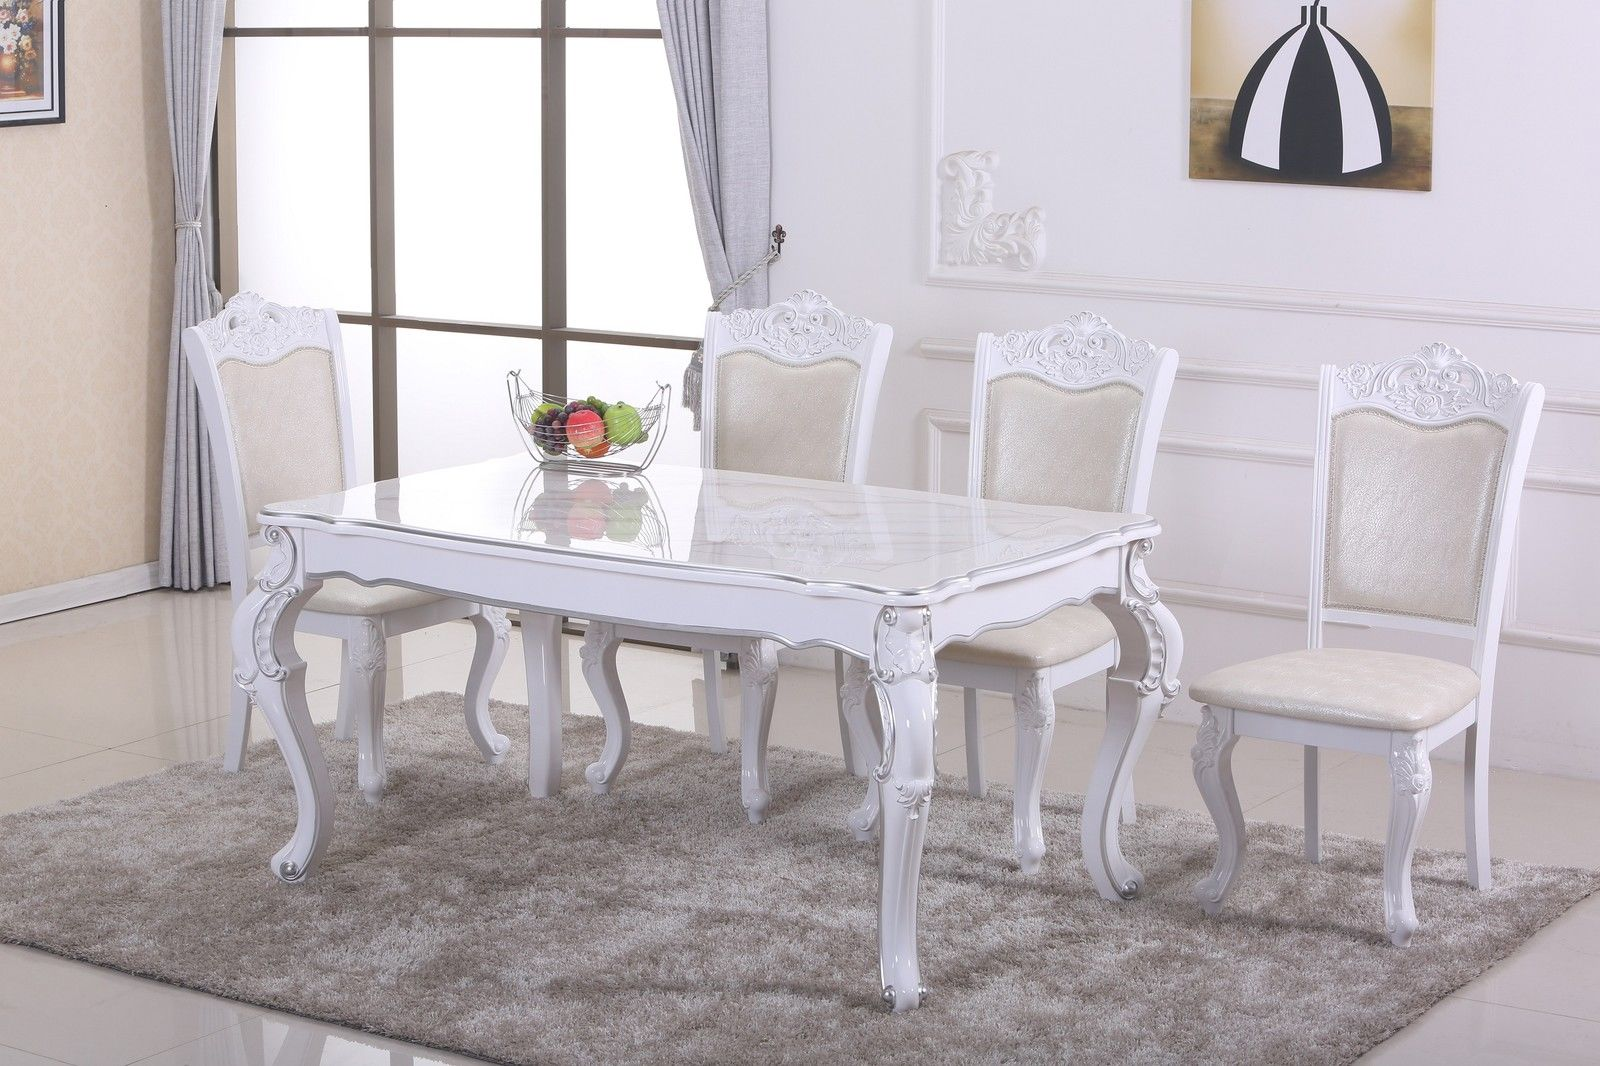 esstisch mit 6 st hle hochglanz massivholz m bel 29. Black Bedroom Furniture Sets. Home Design Ideas